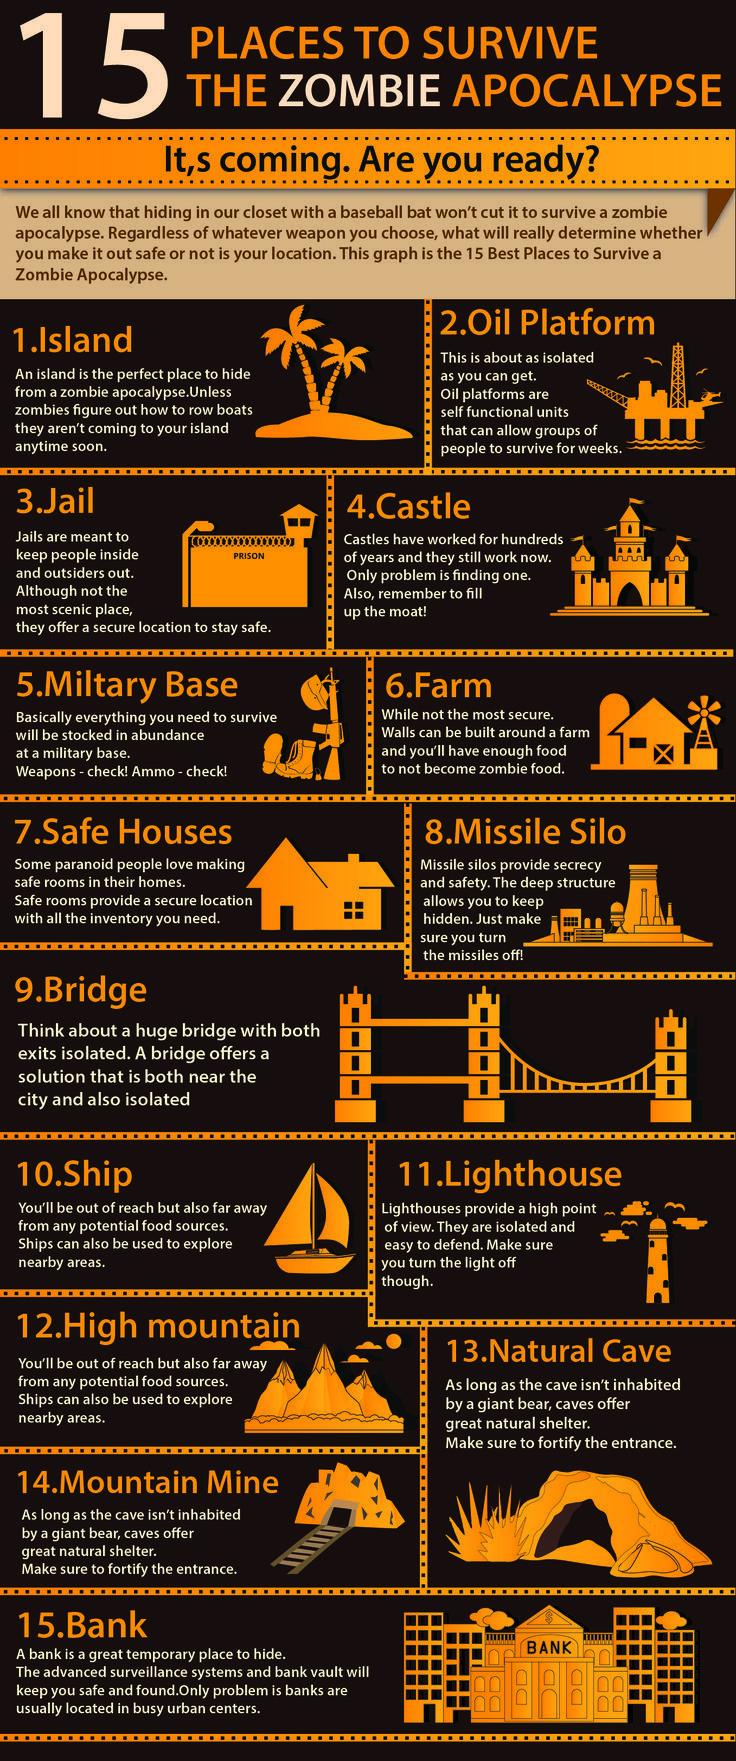 15 Places to Survive The Zombie Apocalypse